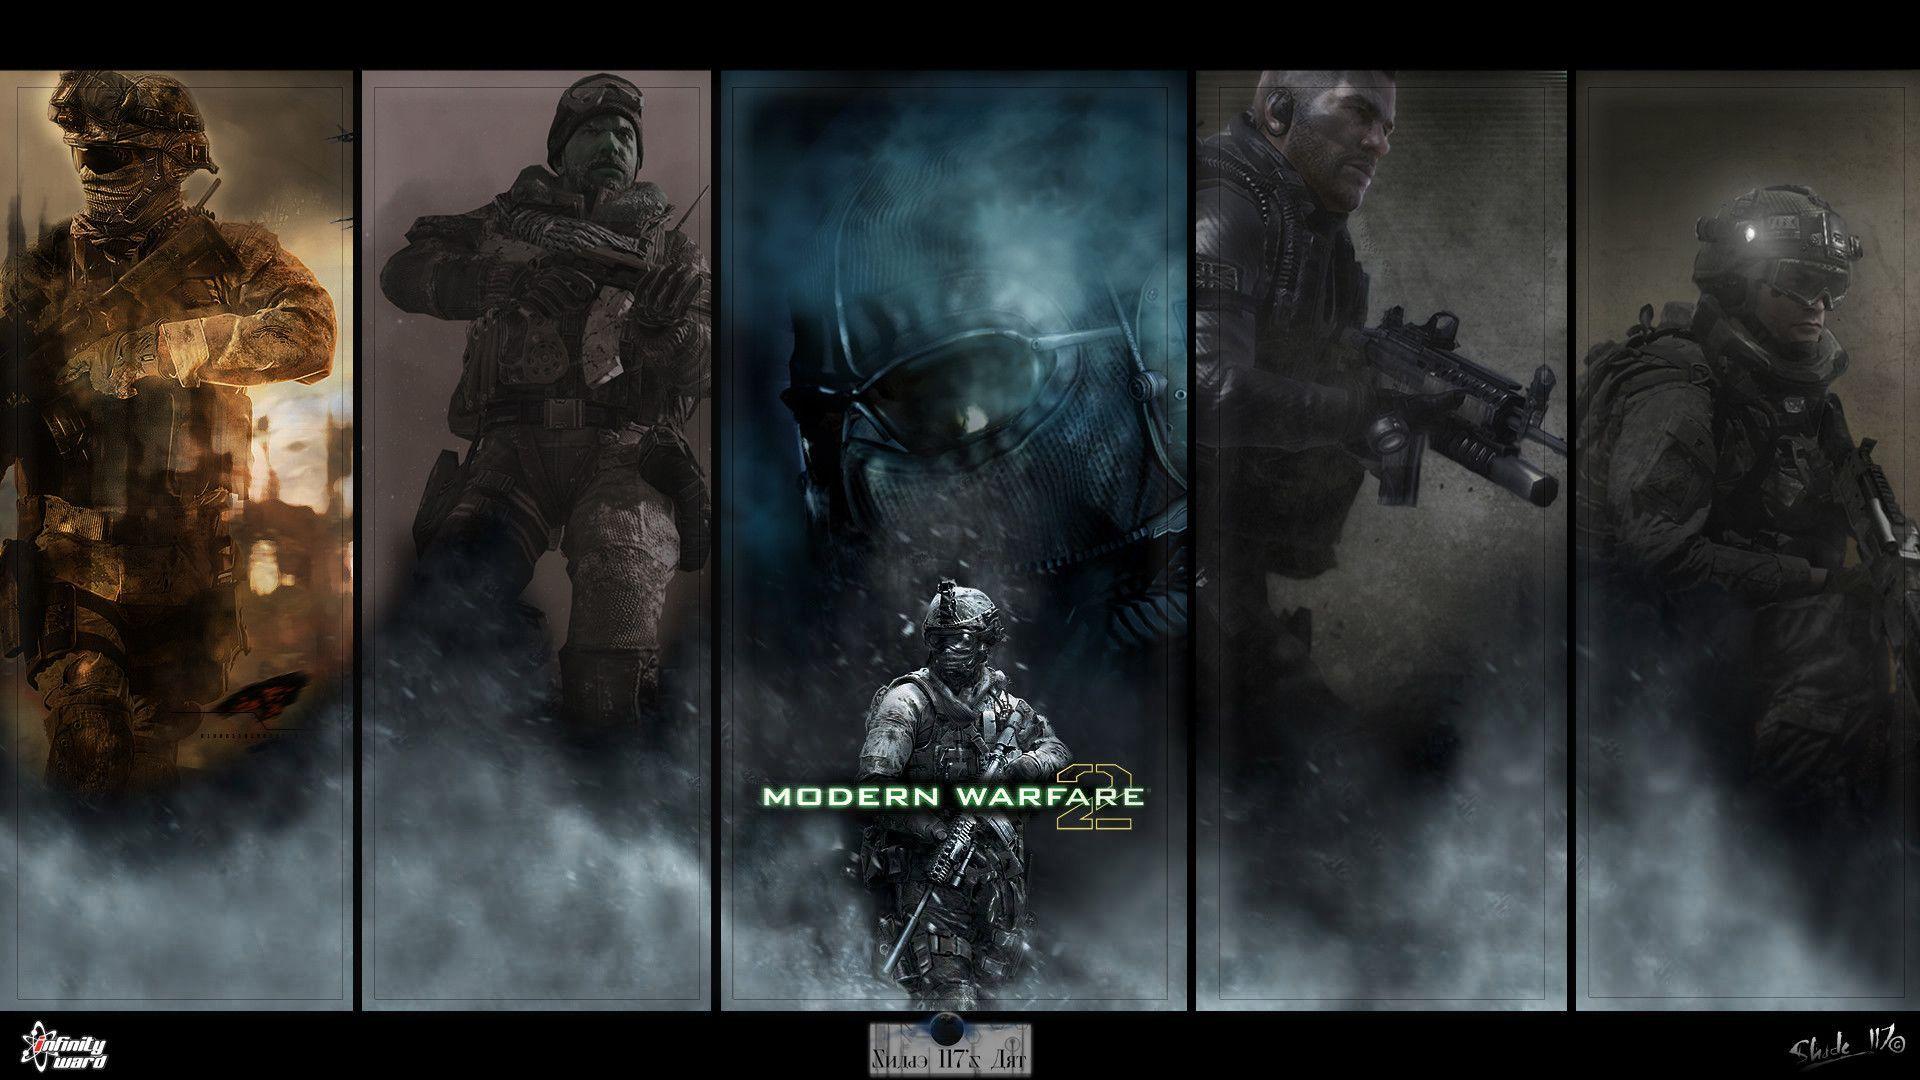 Call-Of-Duty-Advanced-Warfare-HD-desktop-High-wallpaper-wpc5803149